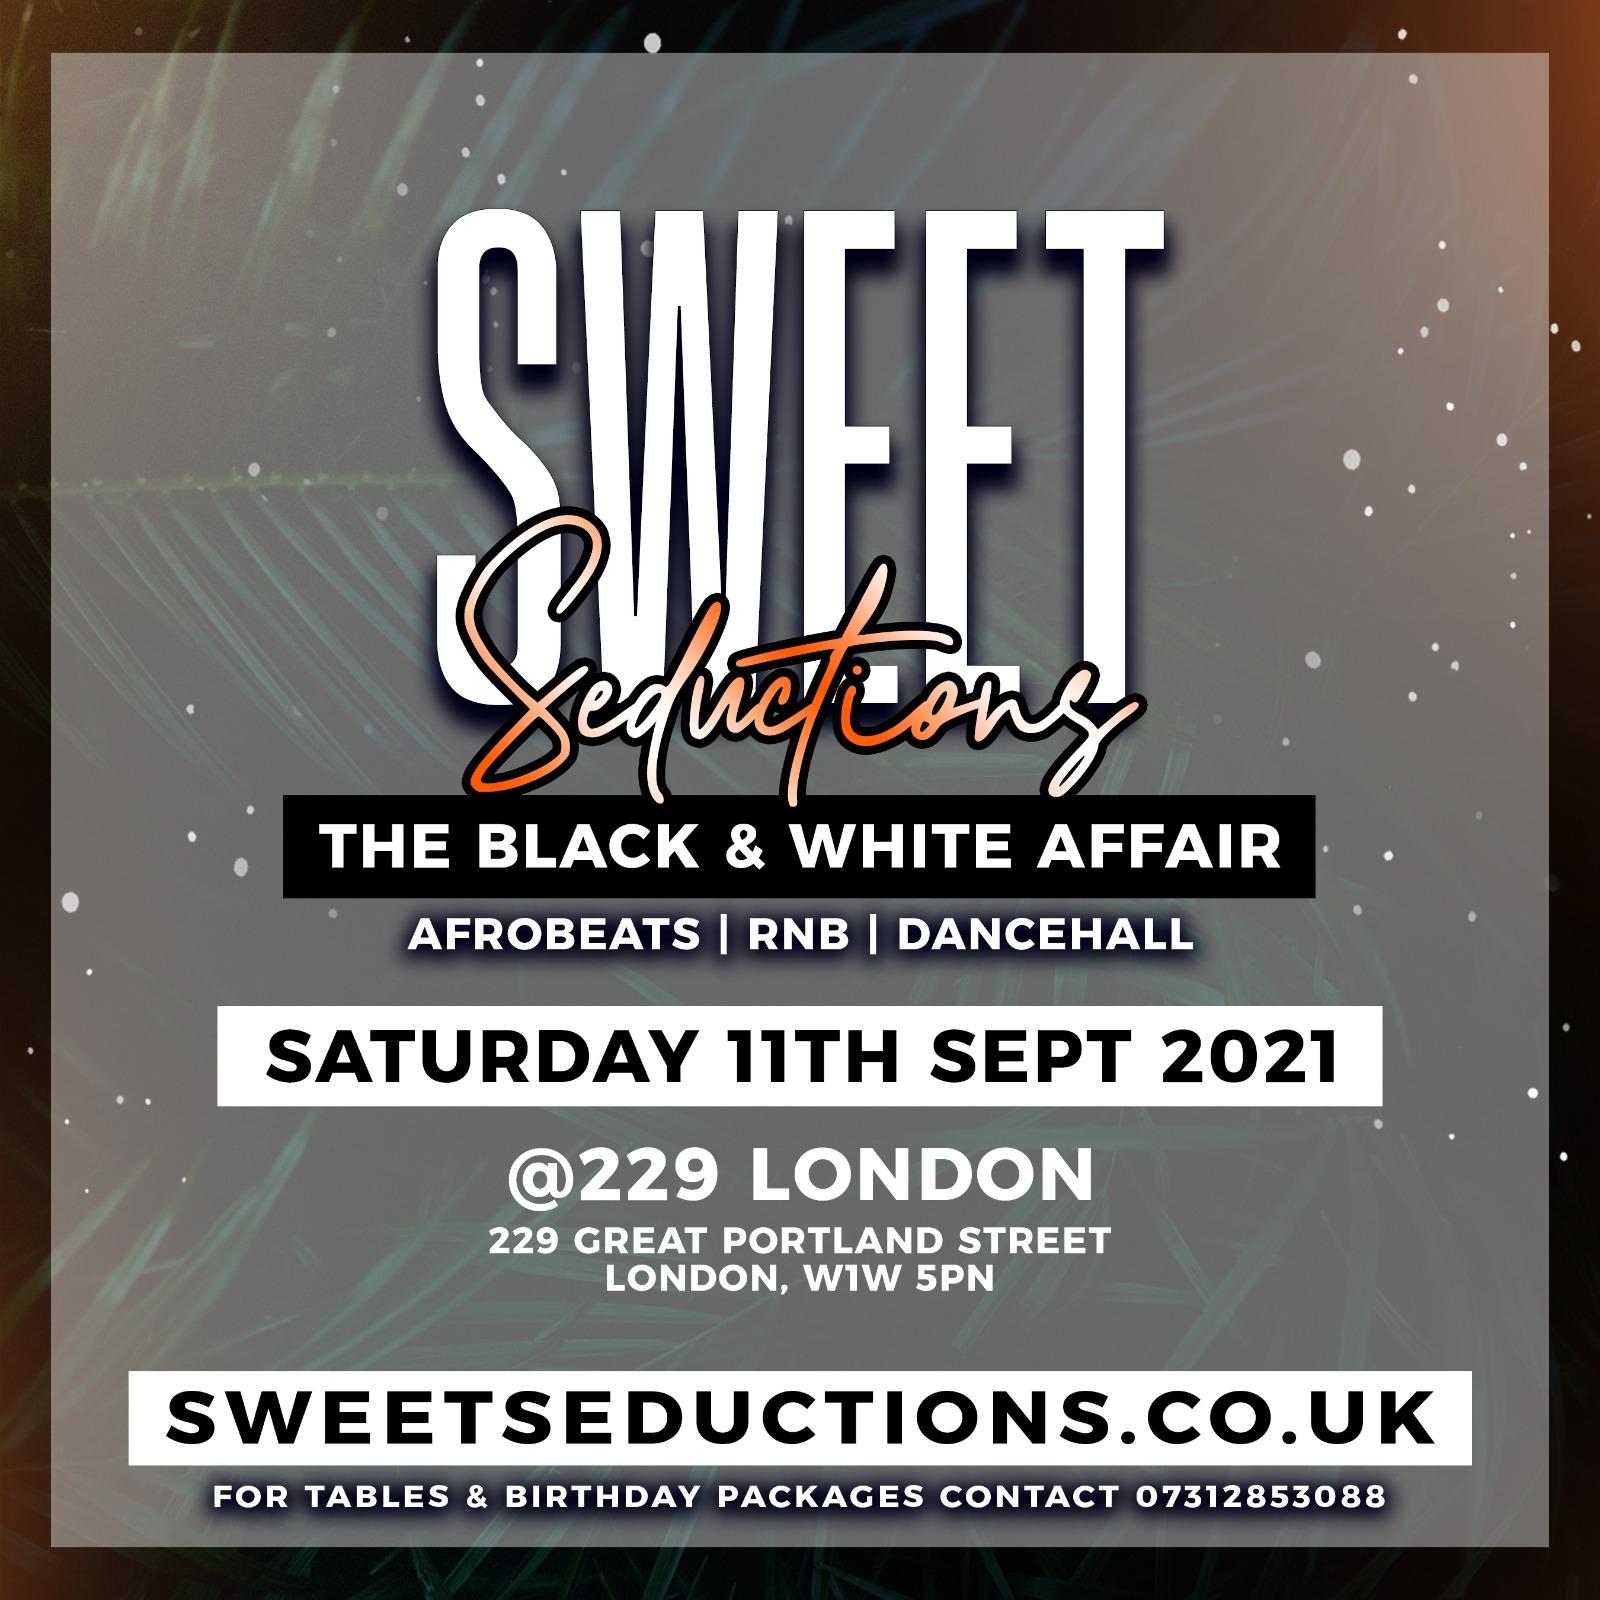 Sweet Seductions The Black & White Affair